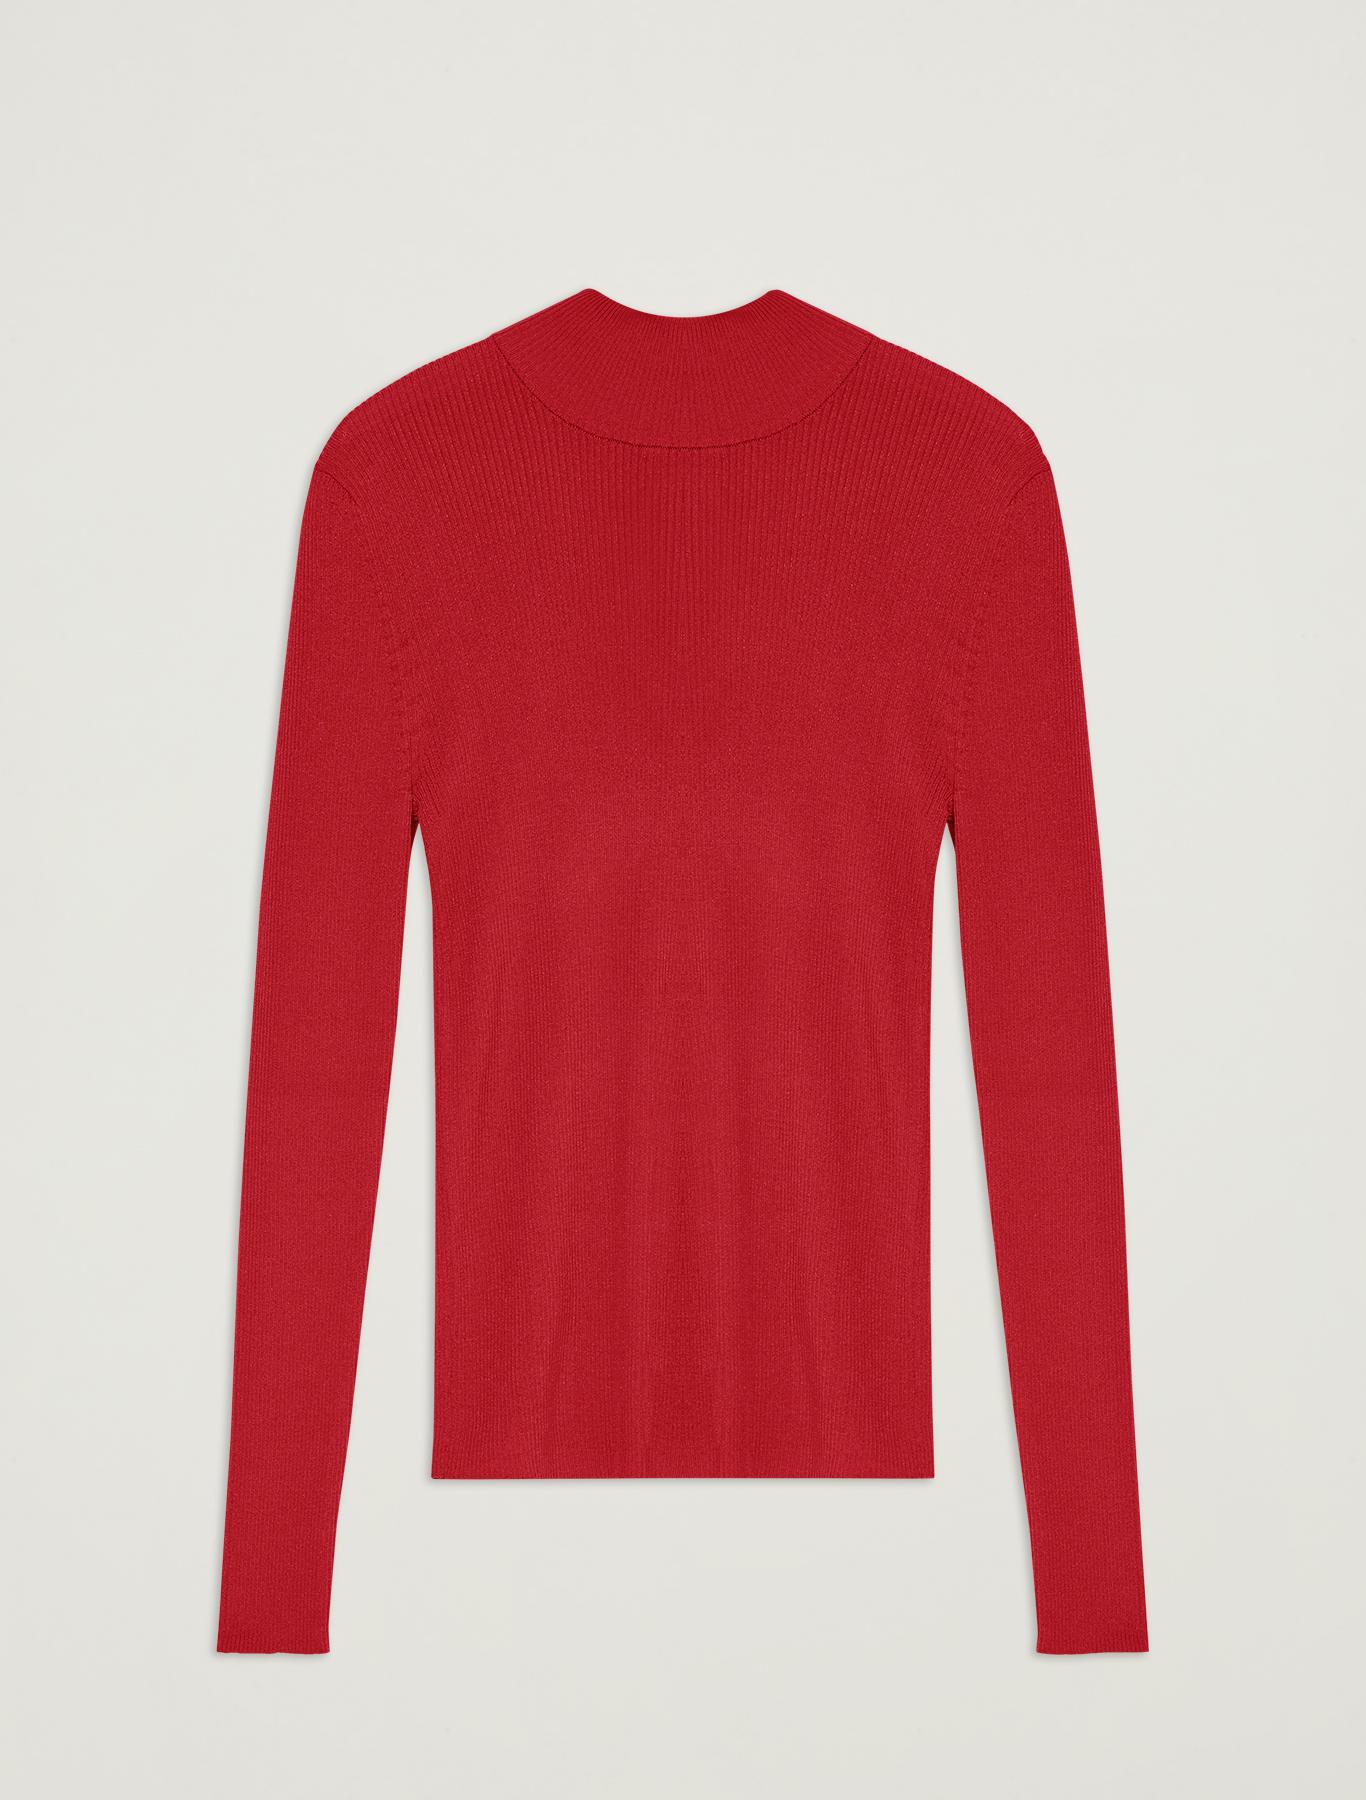 Ribbed knit turtleneck - red - pennyblack